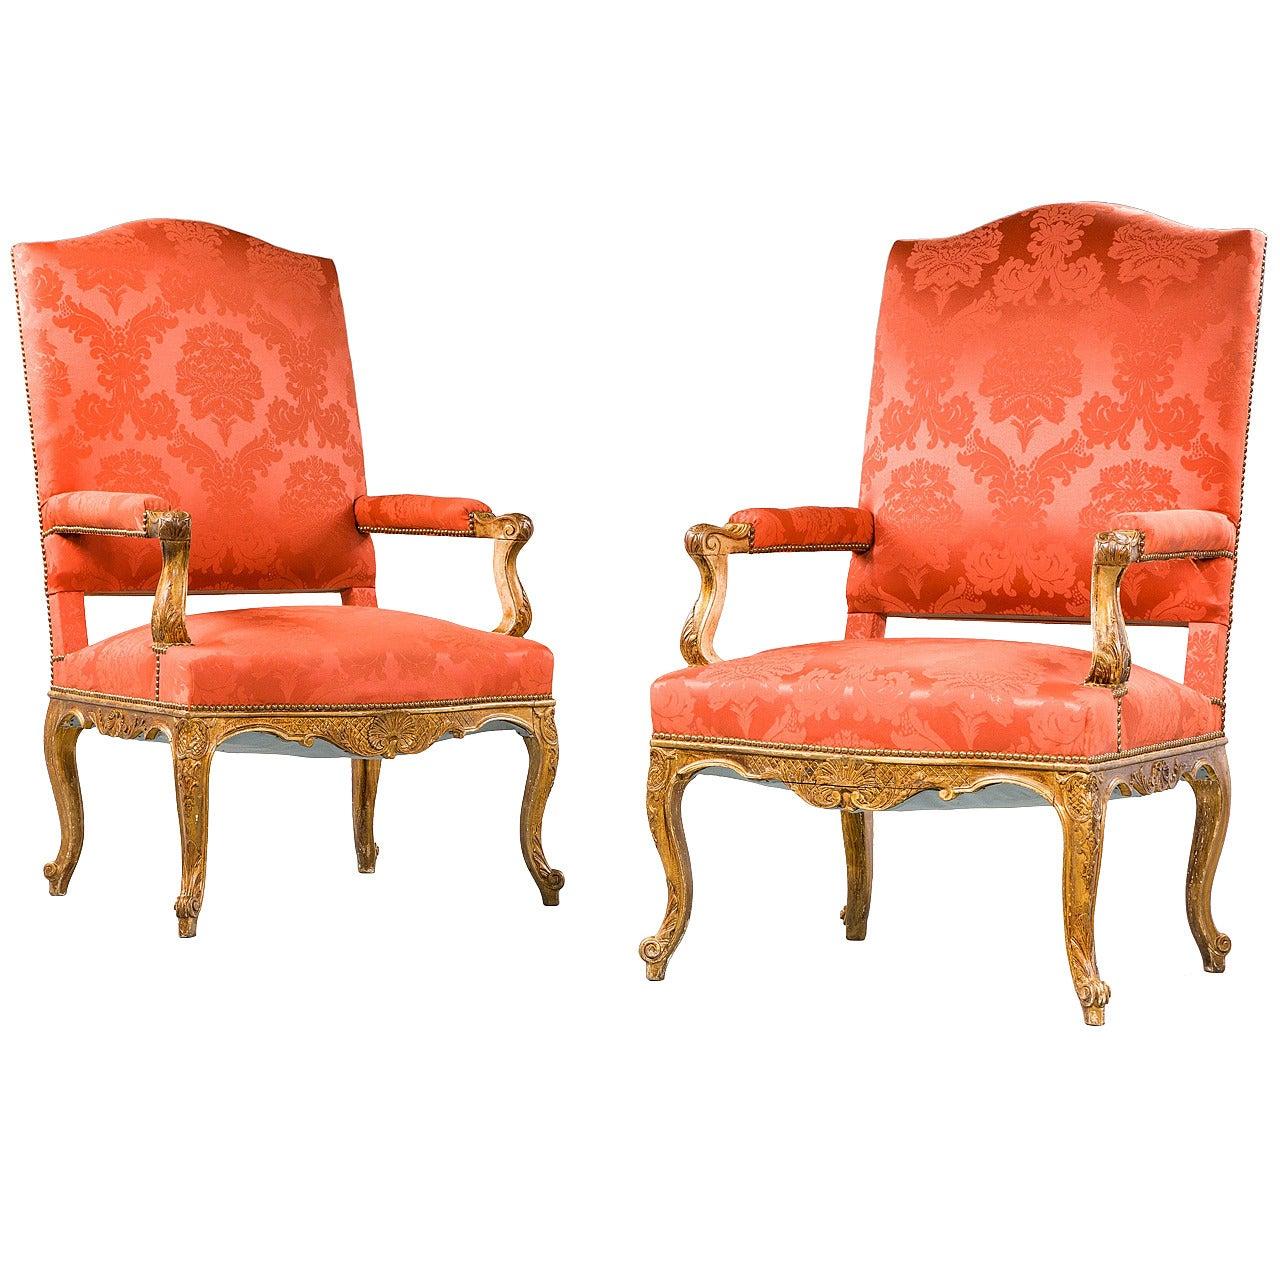 Pair of 19th Century Régence Armchairs